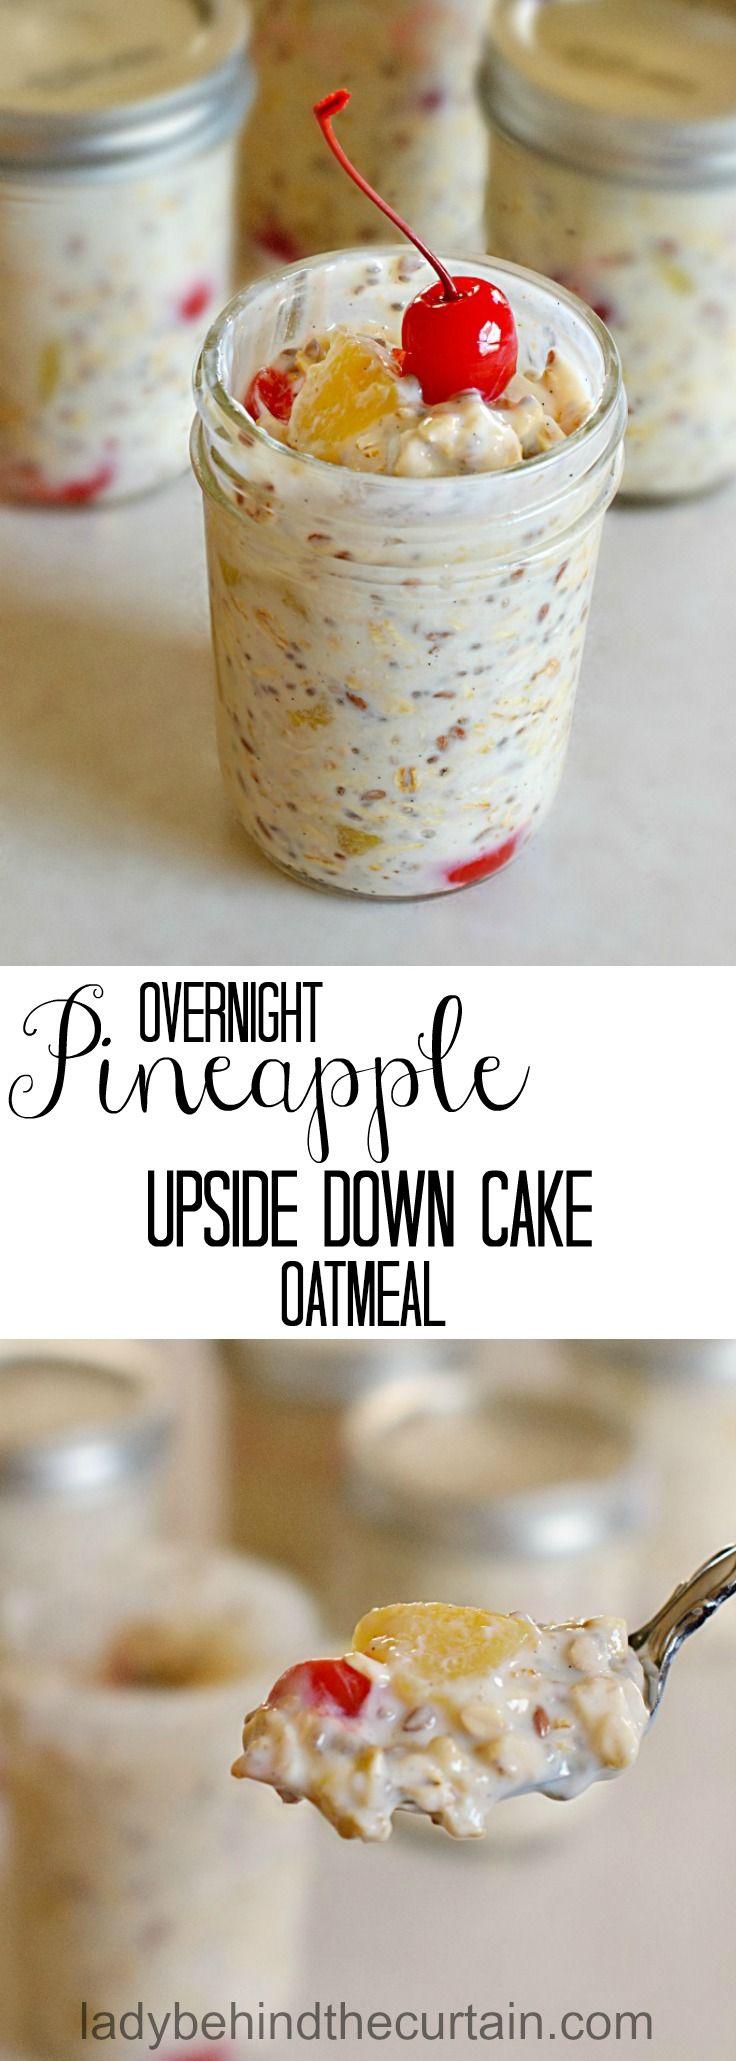 Overnight Pineapple Upside Down Cake Oatmeal   easy grab and go breakfast, healthy snack, mason jar recipe